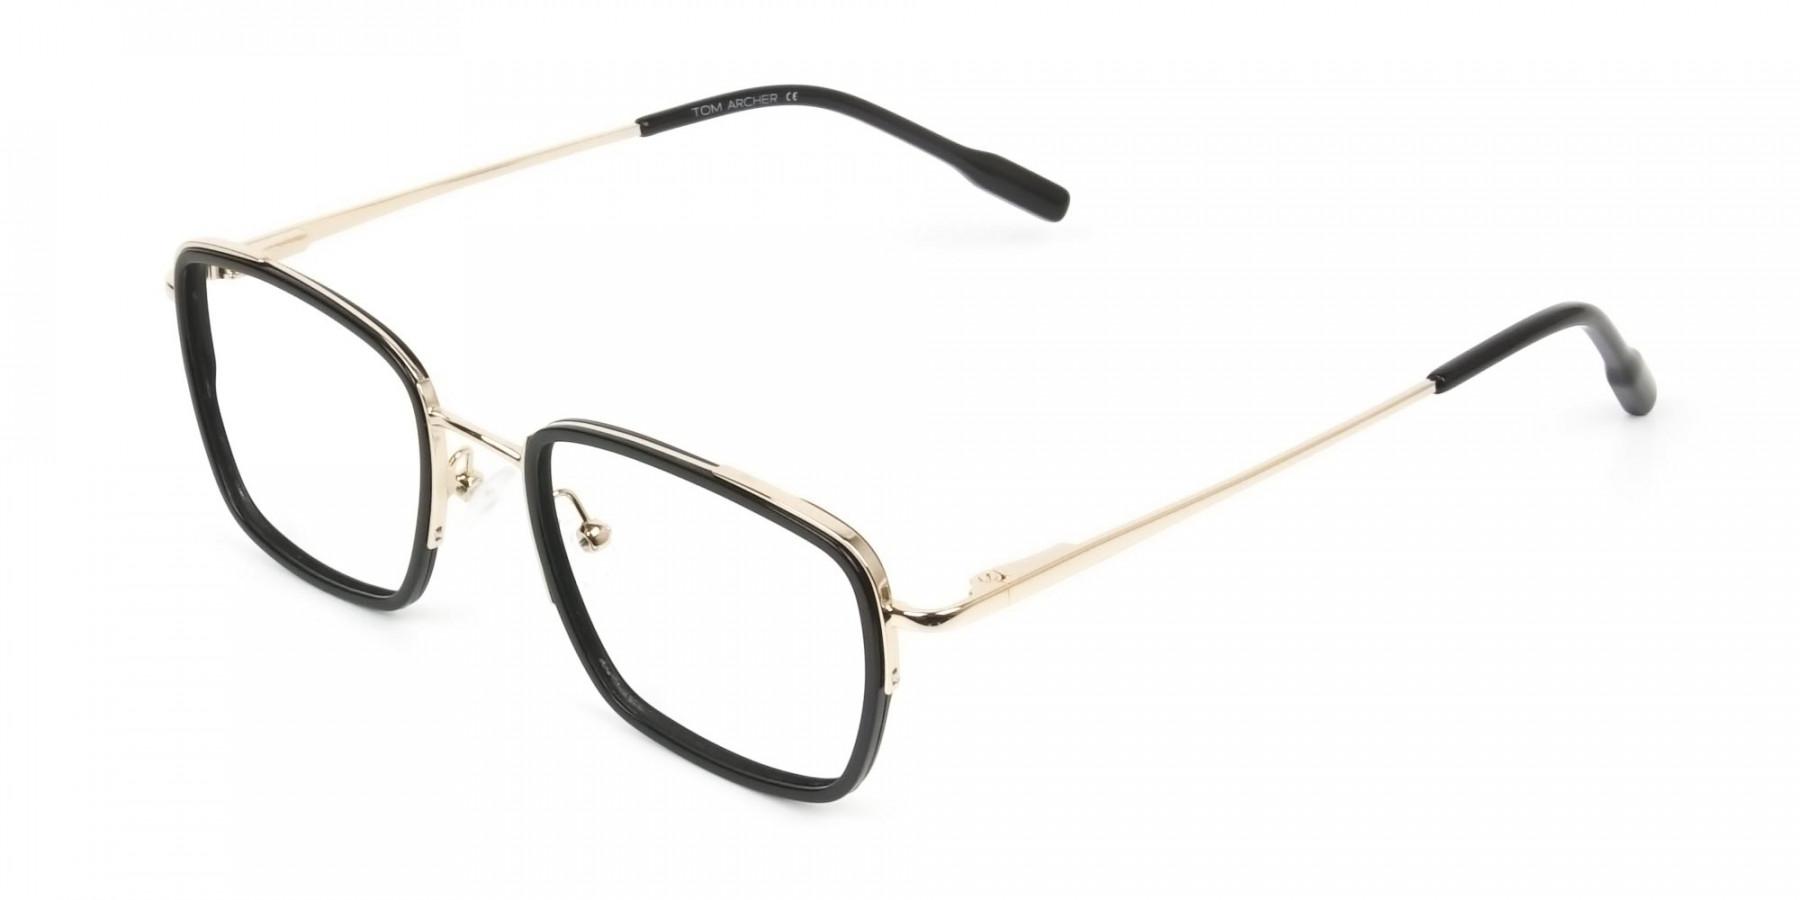 Spider Man Glasses in Black & Gold - 1